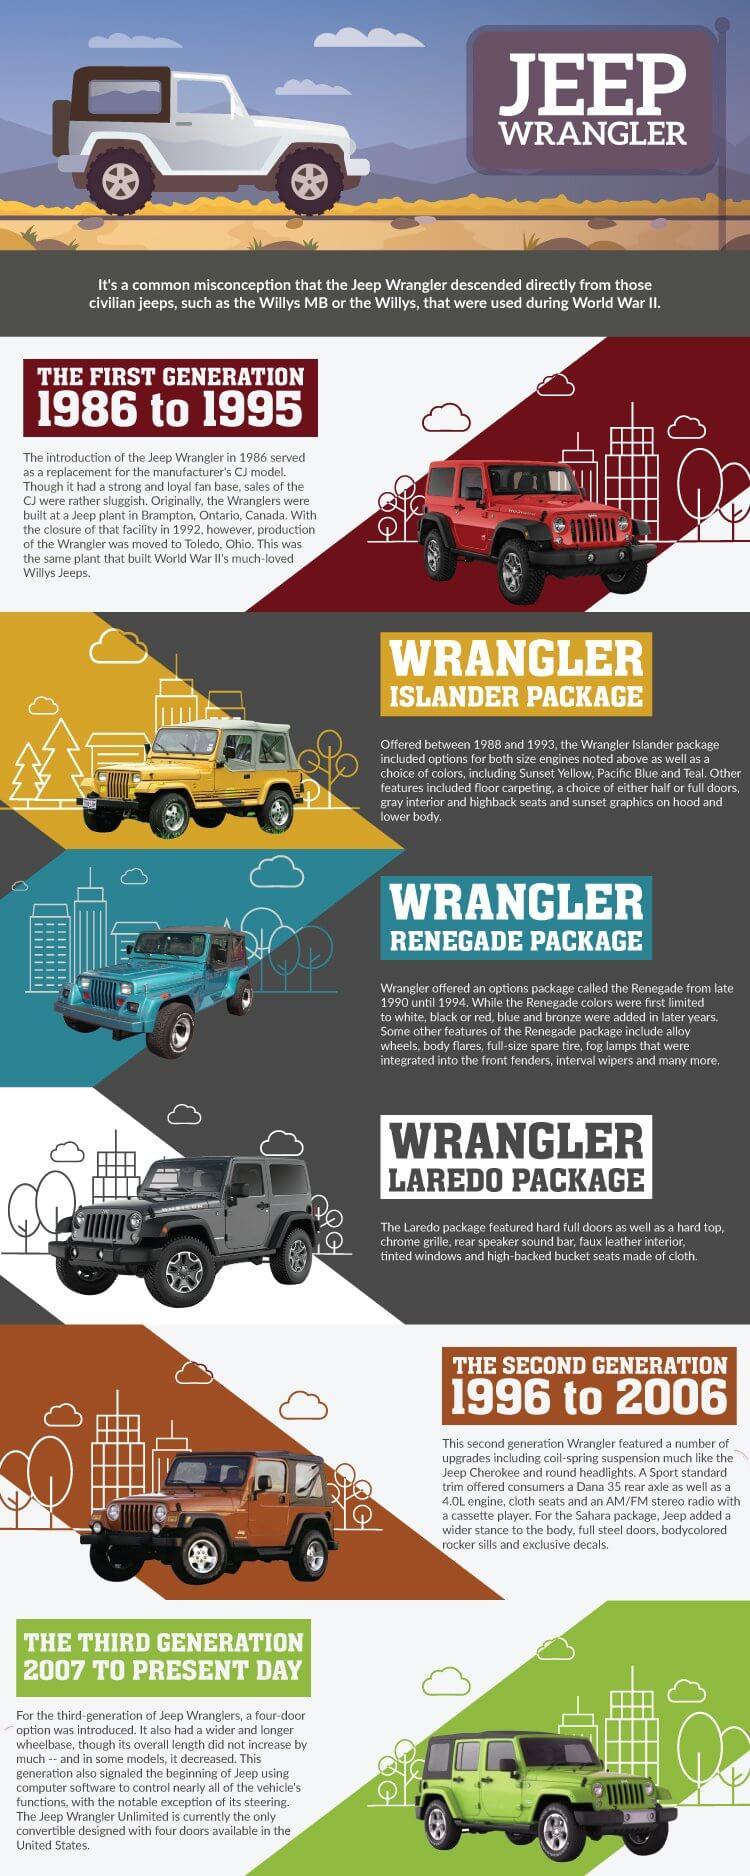 History of the Jeep Wrangler